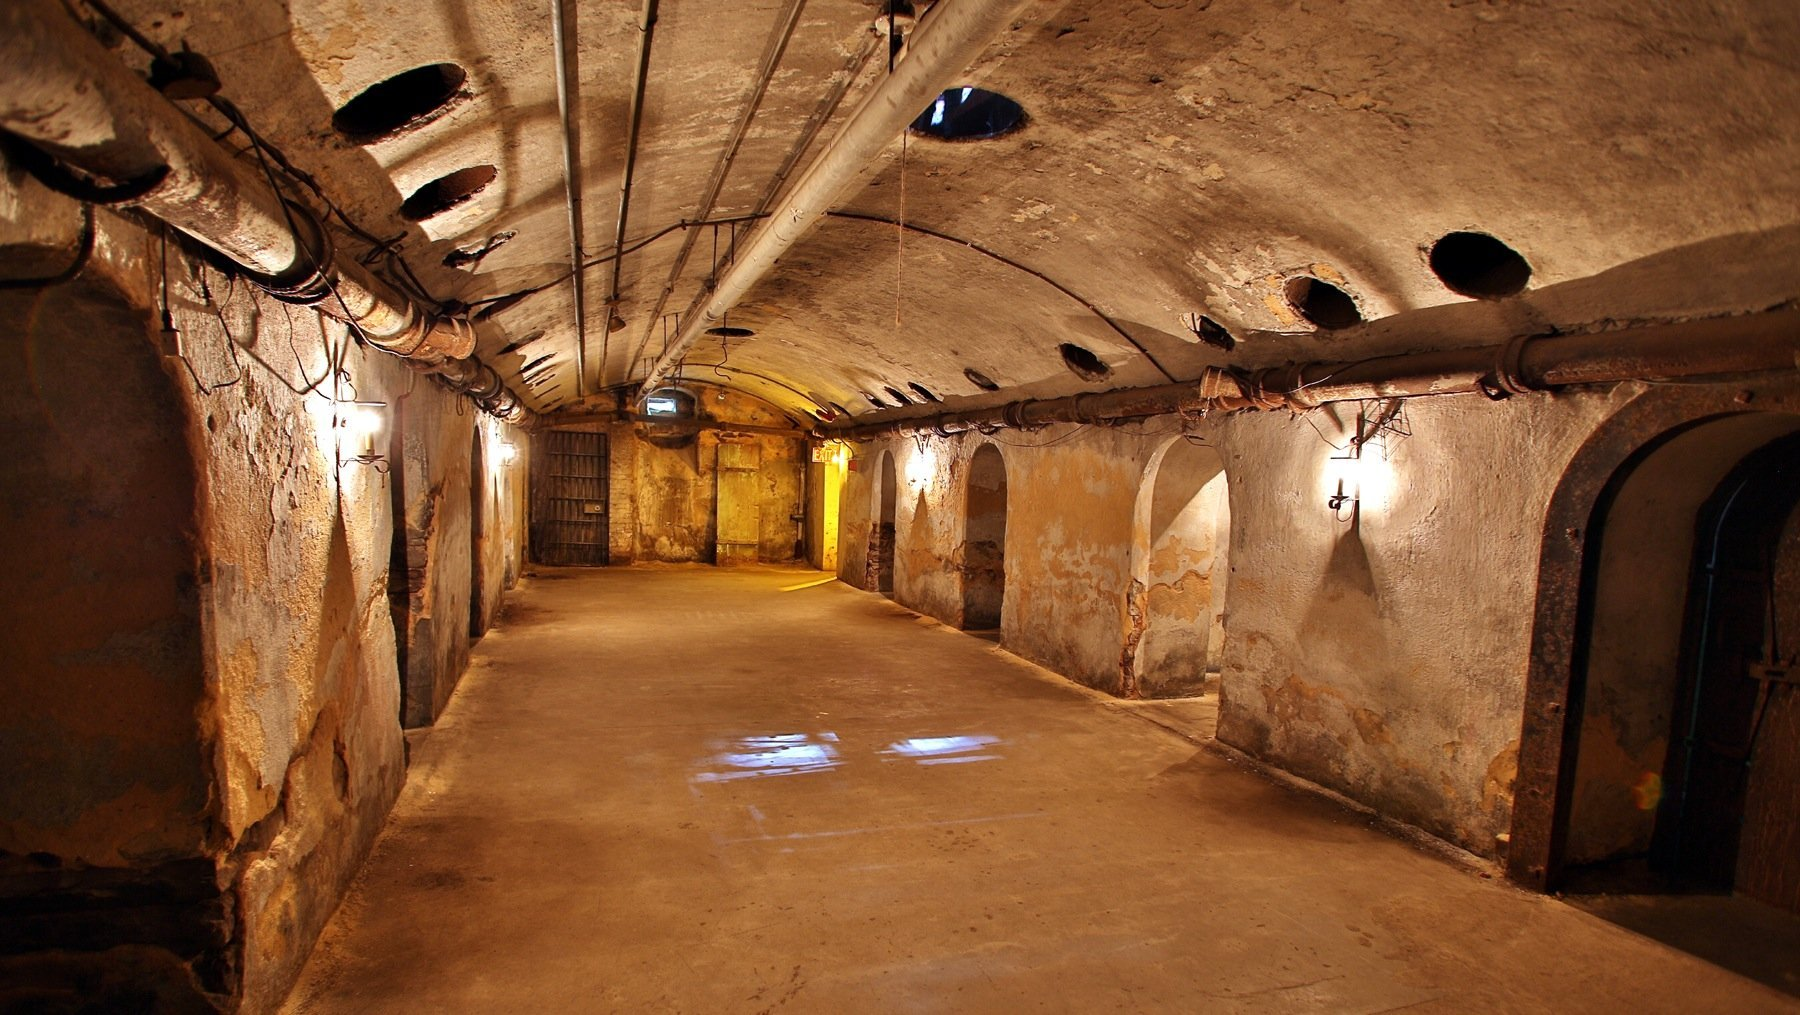 old-jail---dungeon-2jpg-c91989f8d0df0ca4.jpg